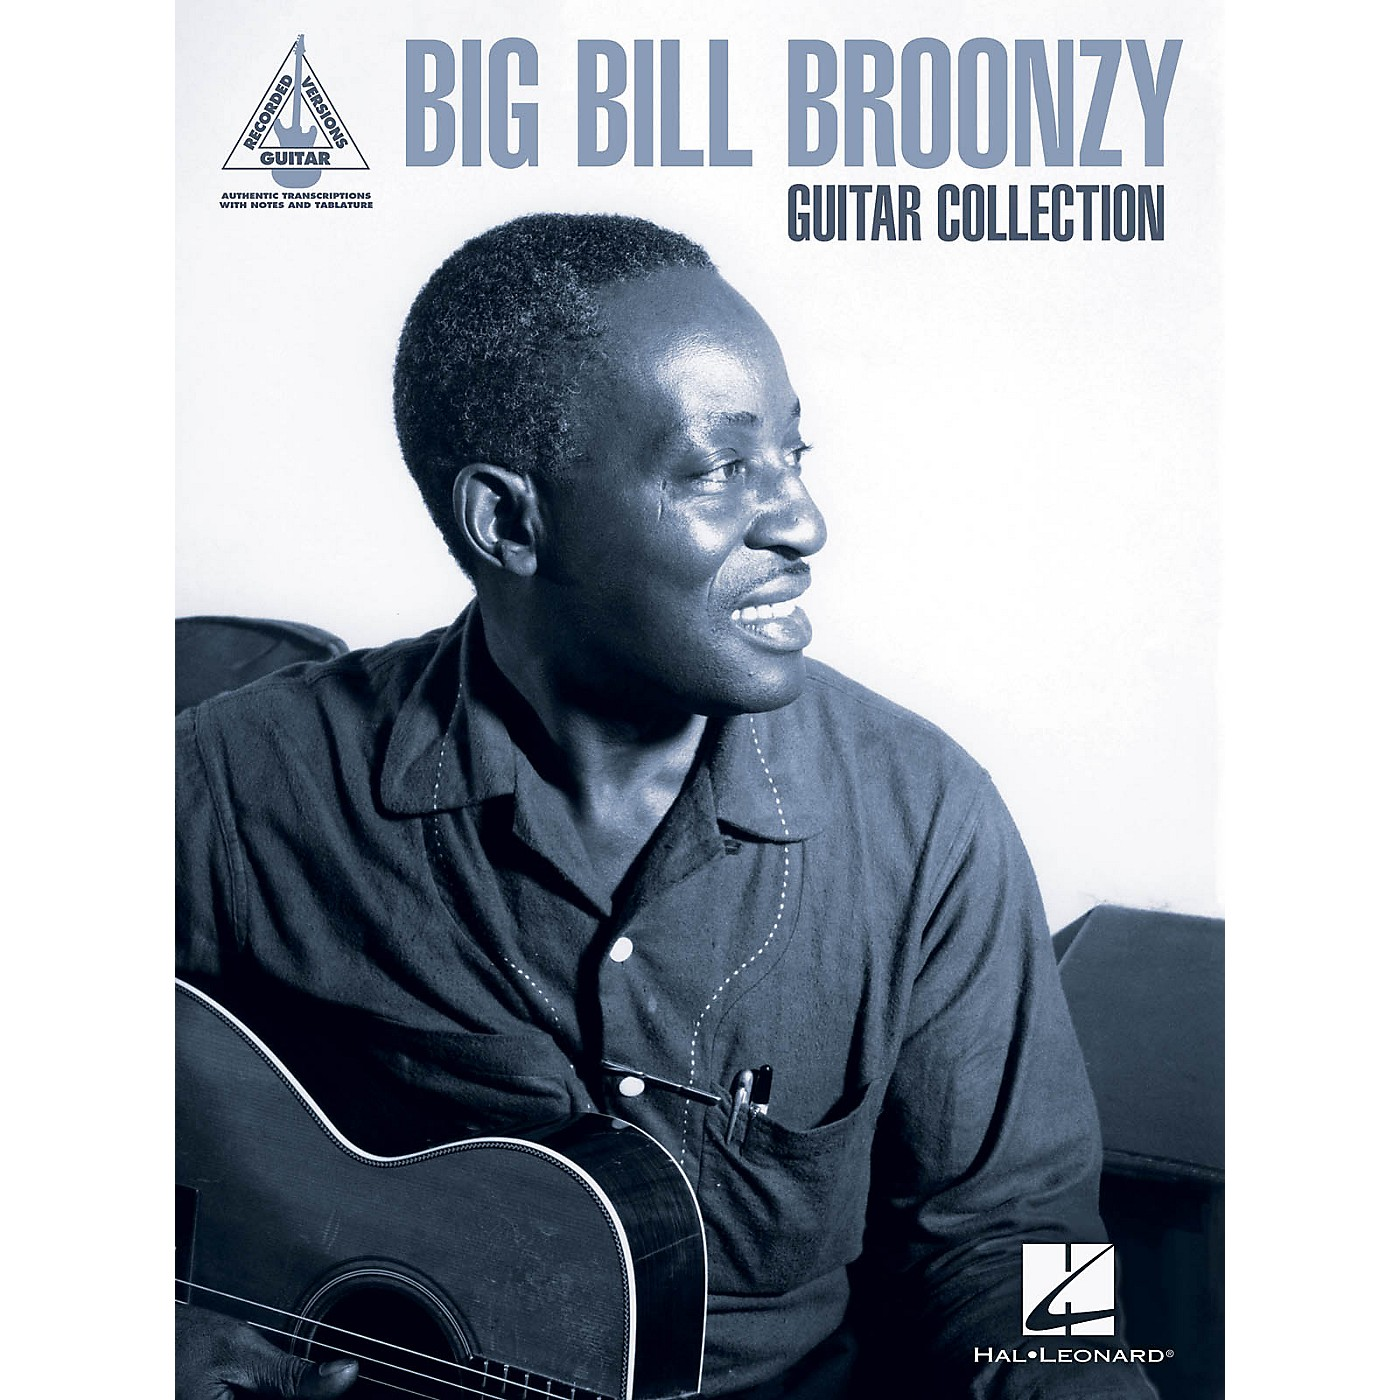 Hal Leonard Big Bill Broonzy Guitar Collection Guitar Tab Songbook thumbnail